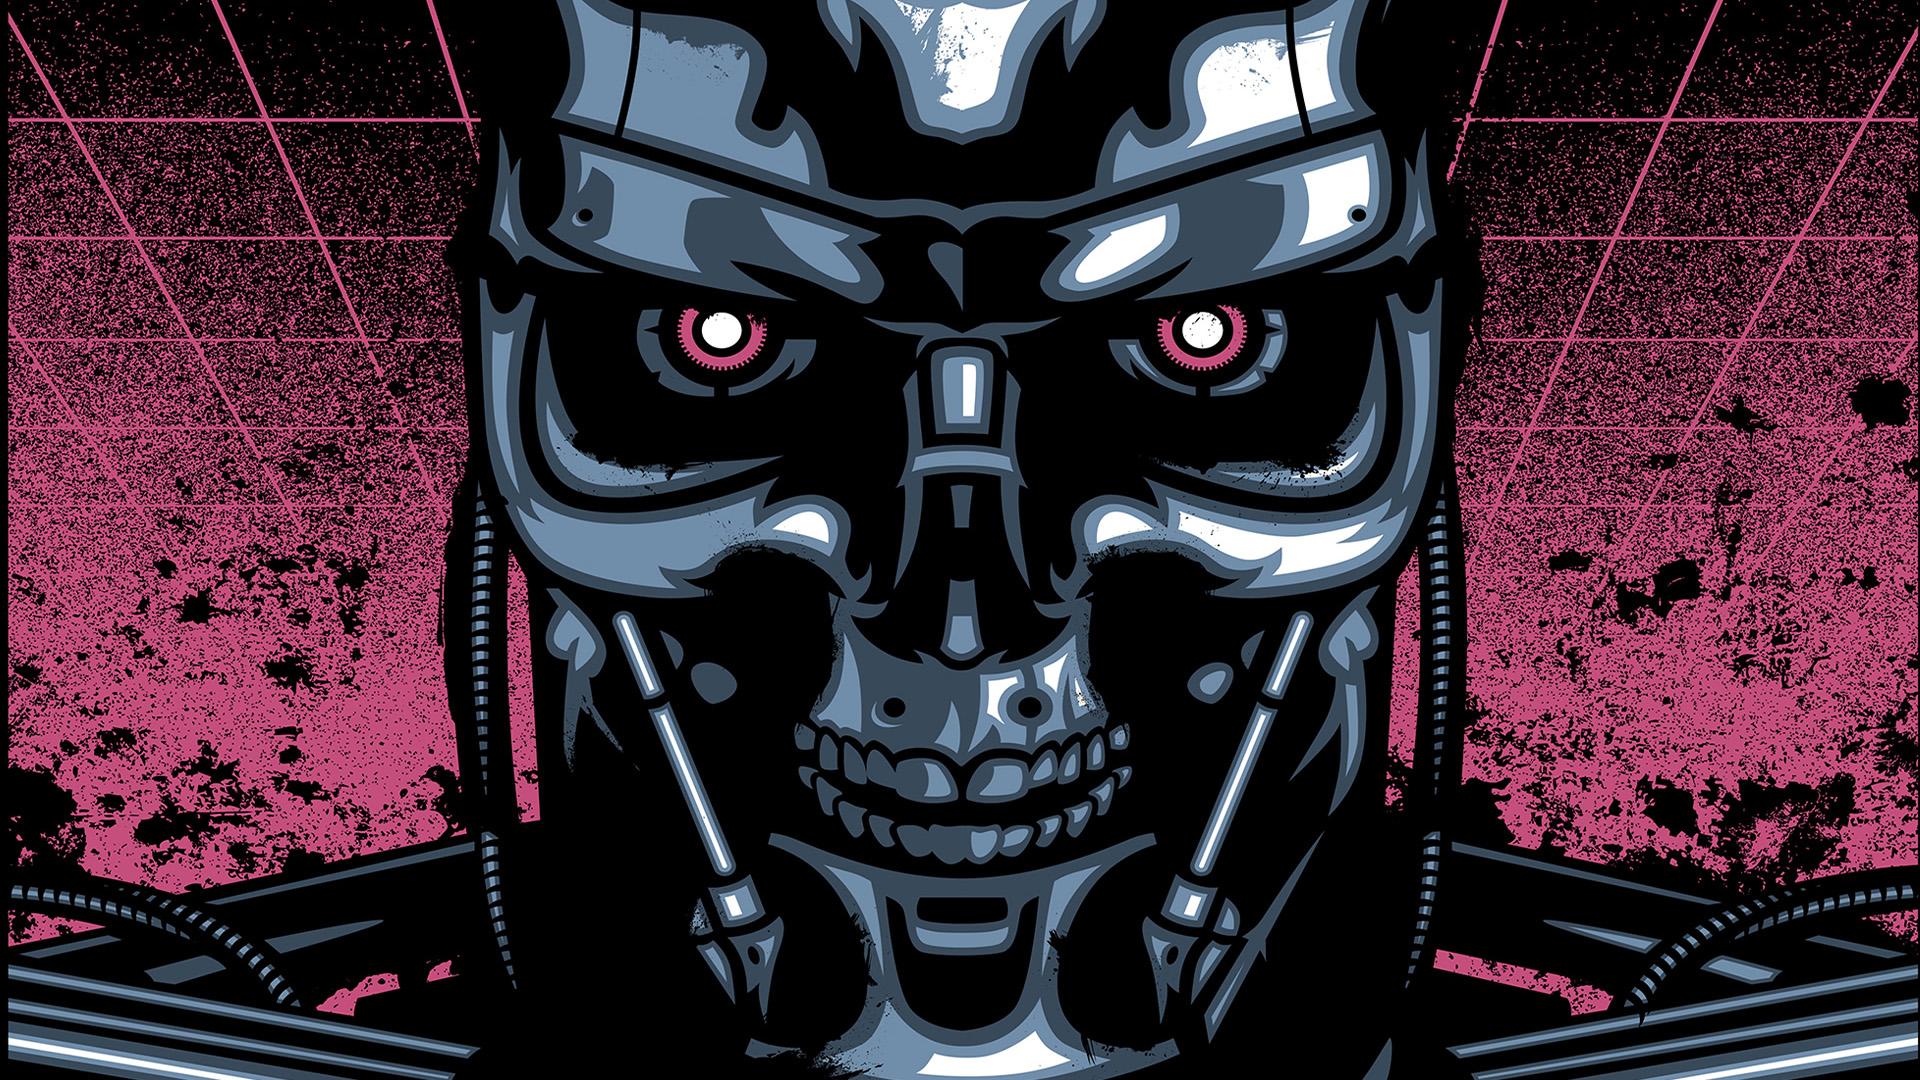 Terminator 2 judgment day hd wallpaper background image 1920x1080 id 674074 wallpaper abyss - Terminator 2 wallpaper hd ...